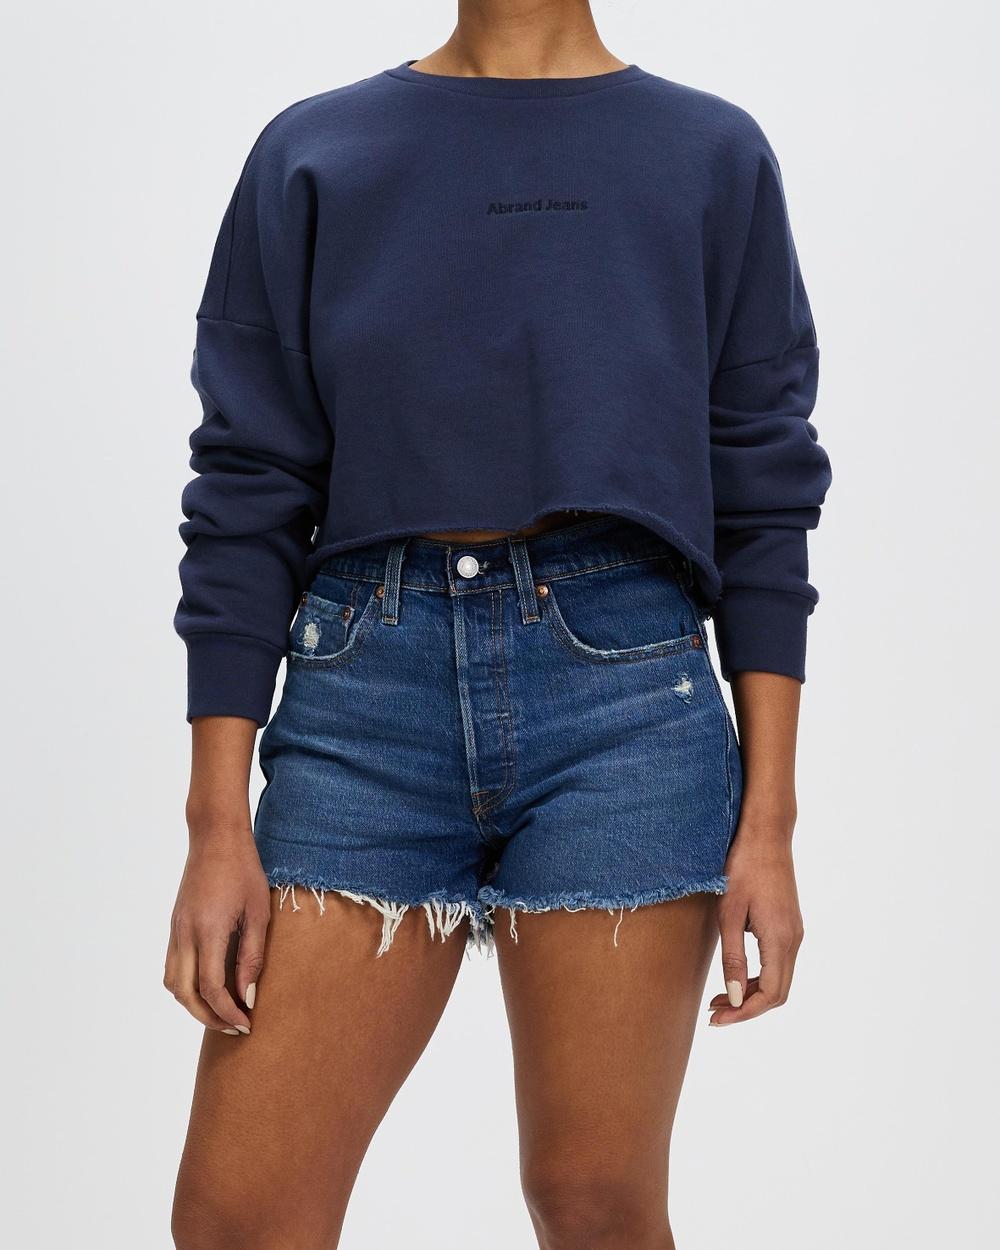 Abrand A Oversized Crop Sweater Sweats Navy